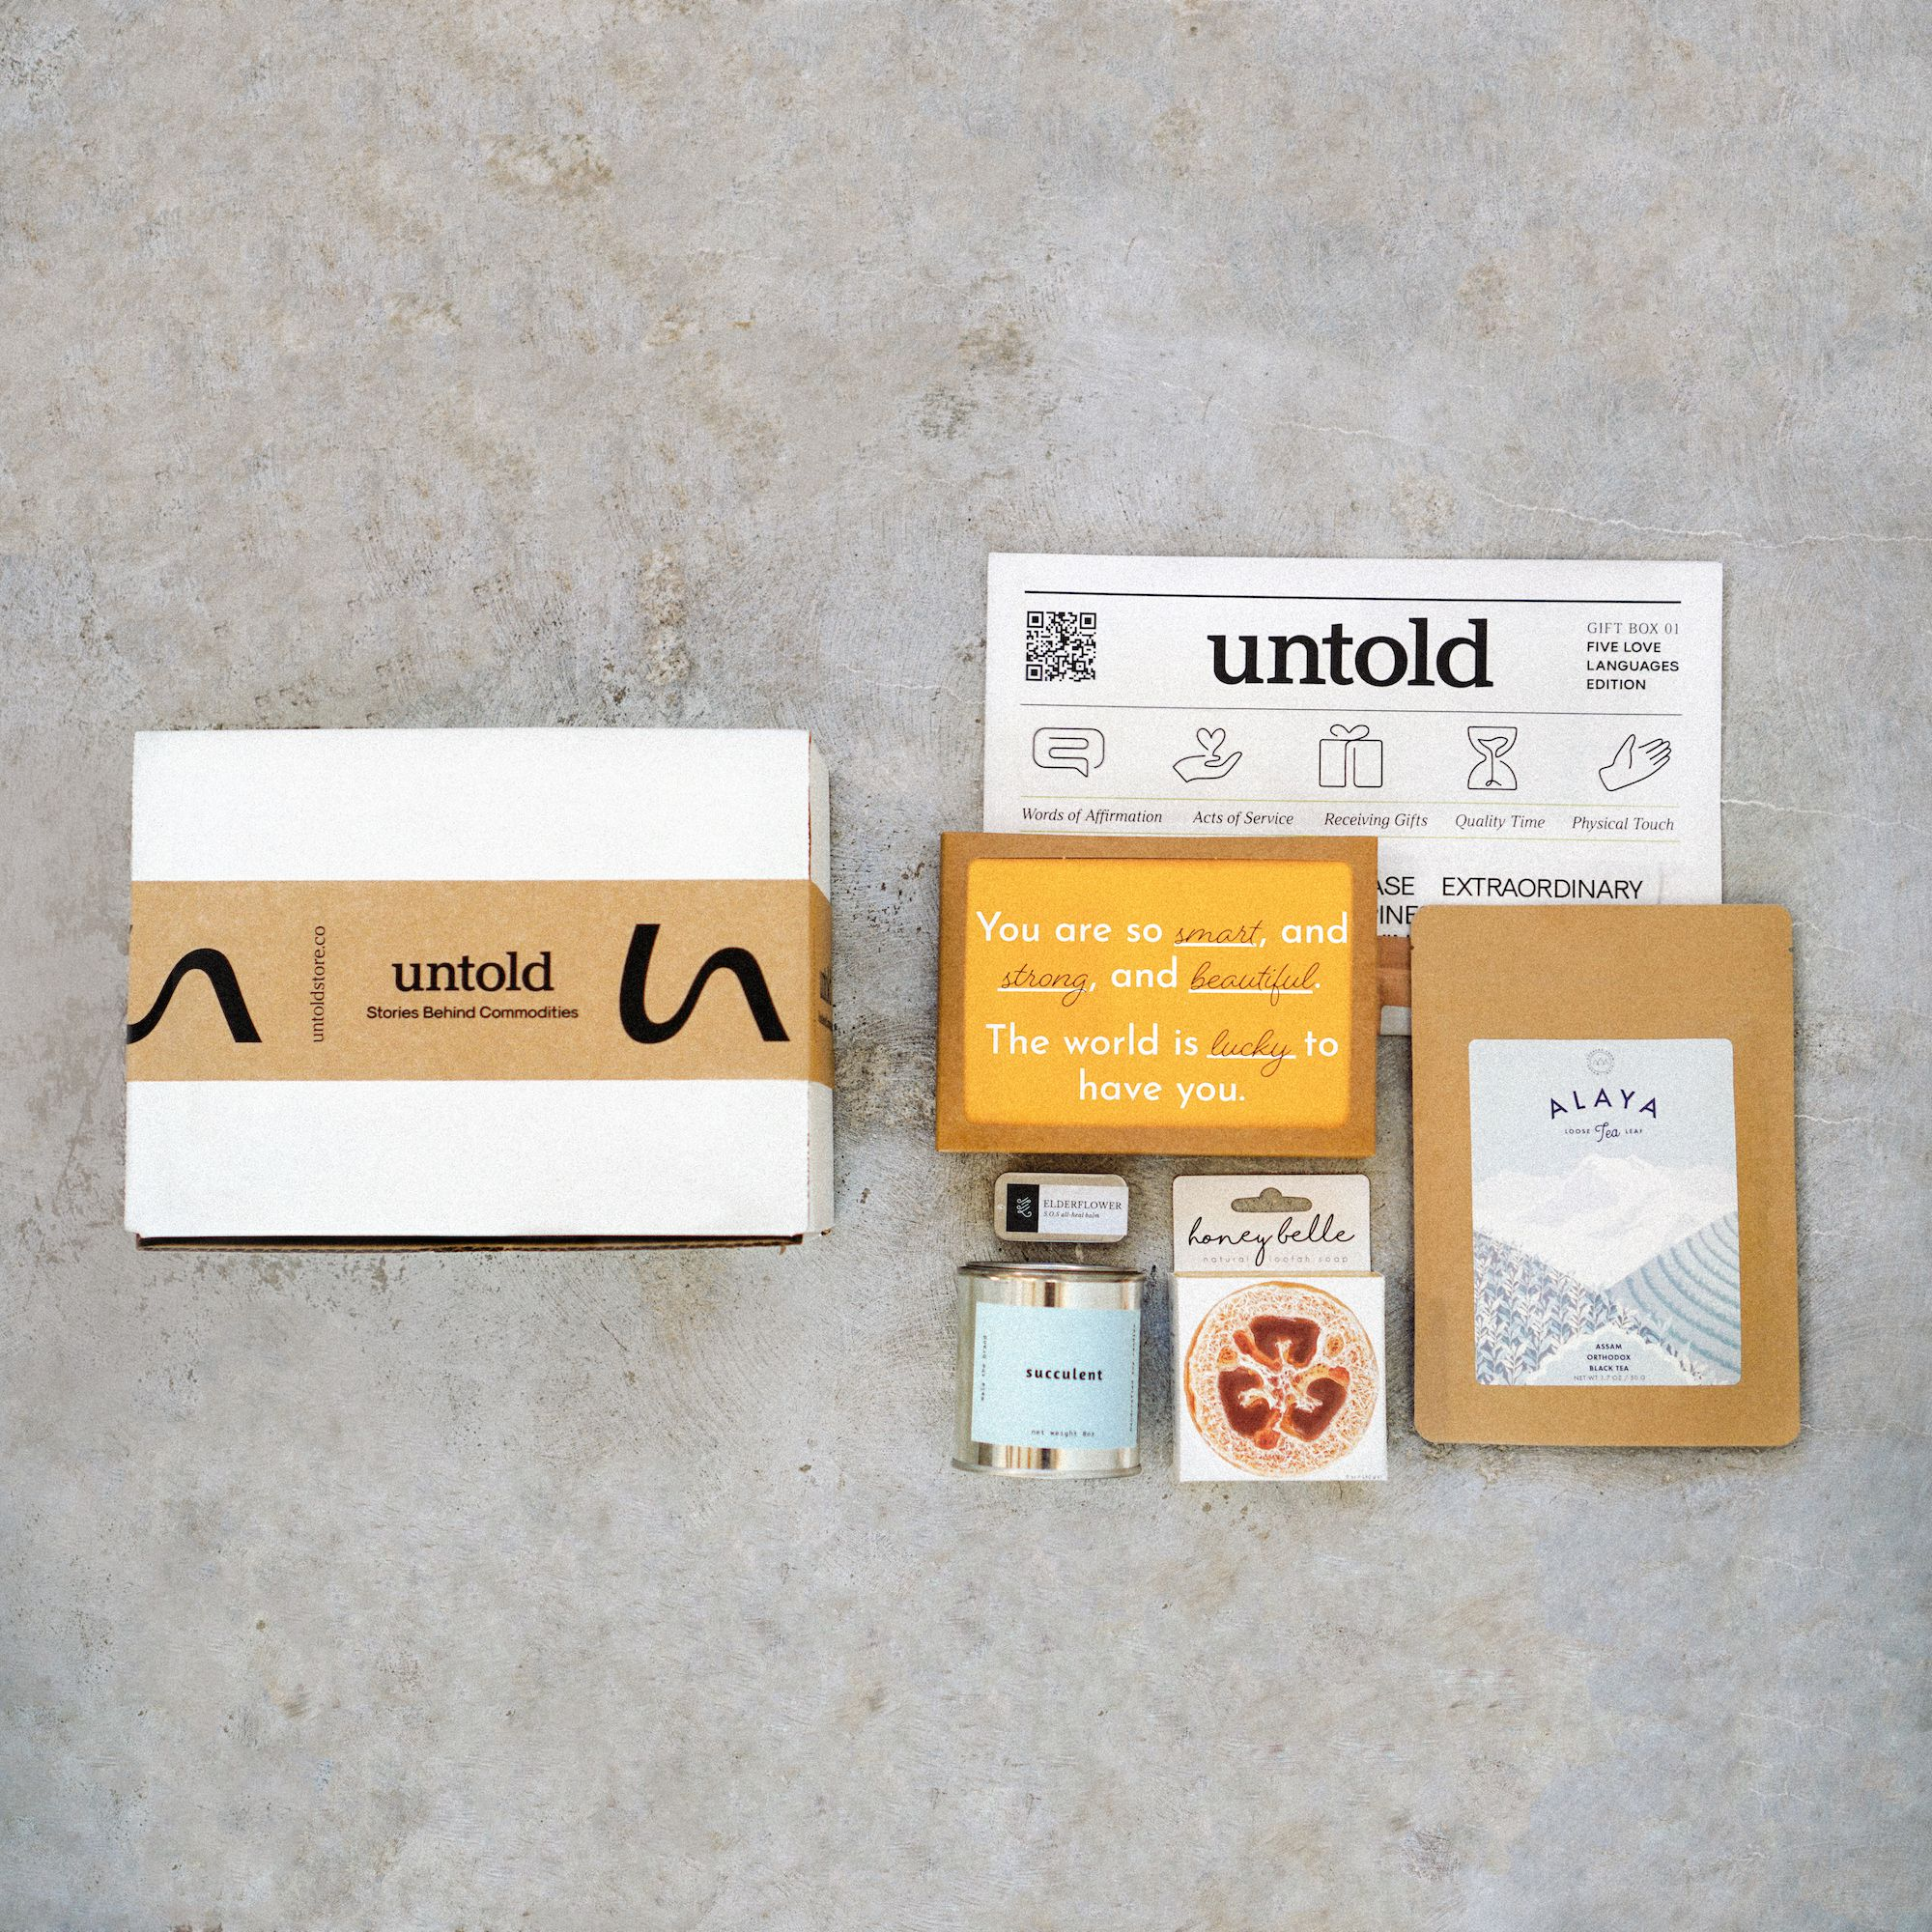 untold: Putting the Spotlight on BIPOC Entrepreneurs